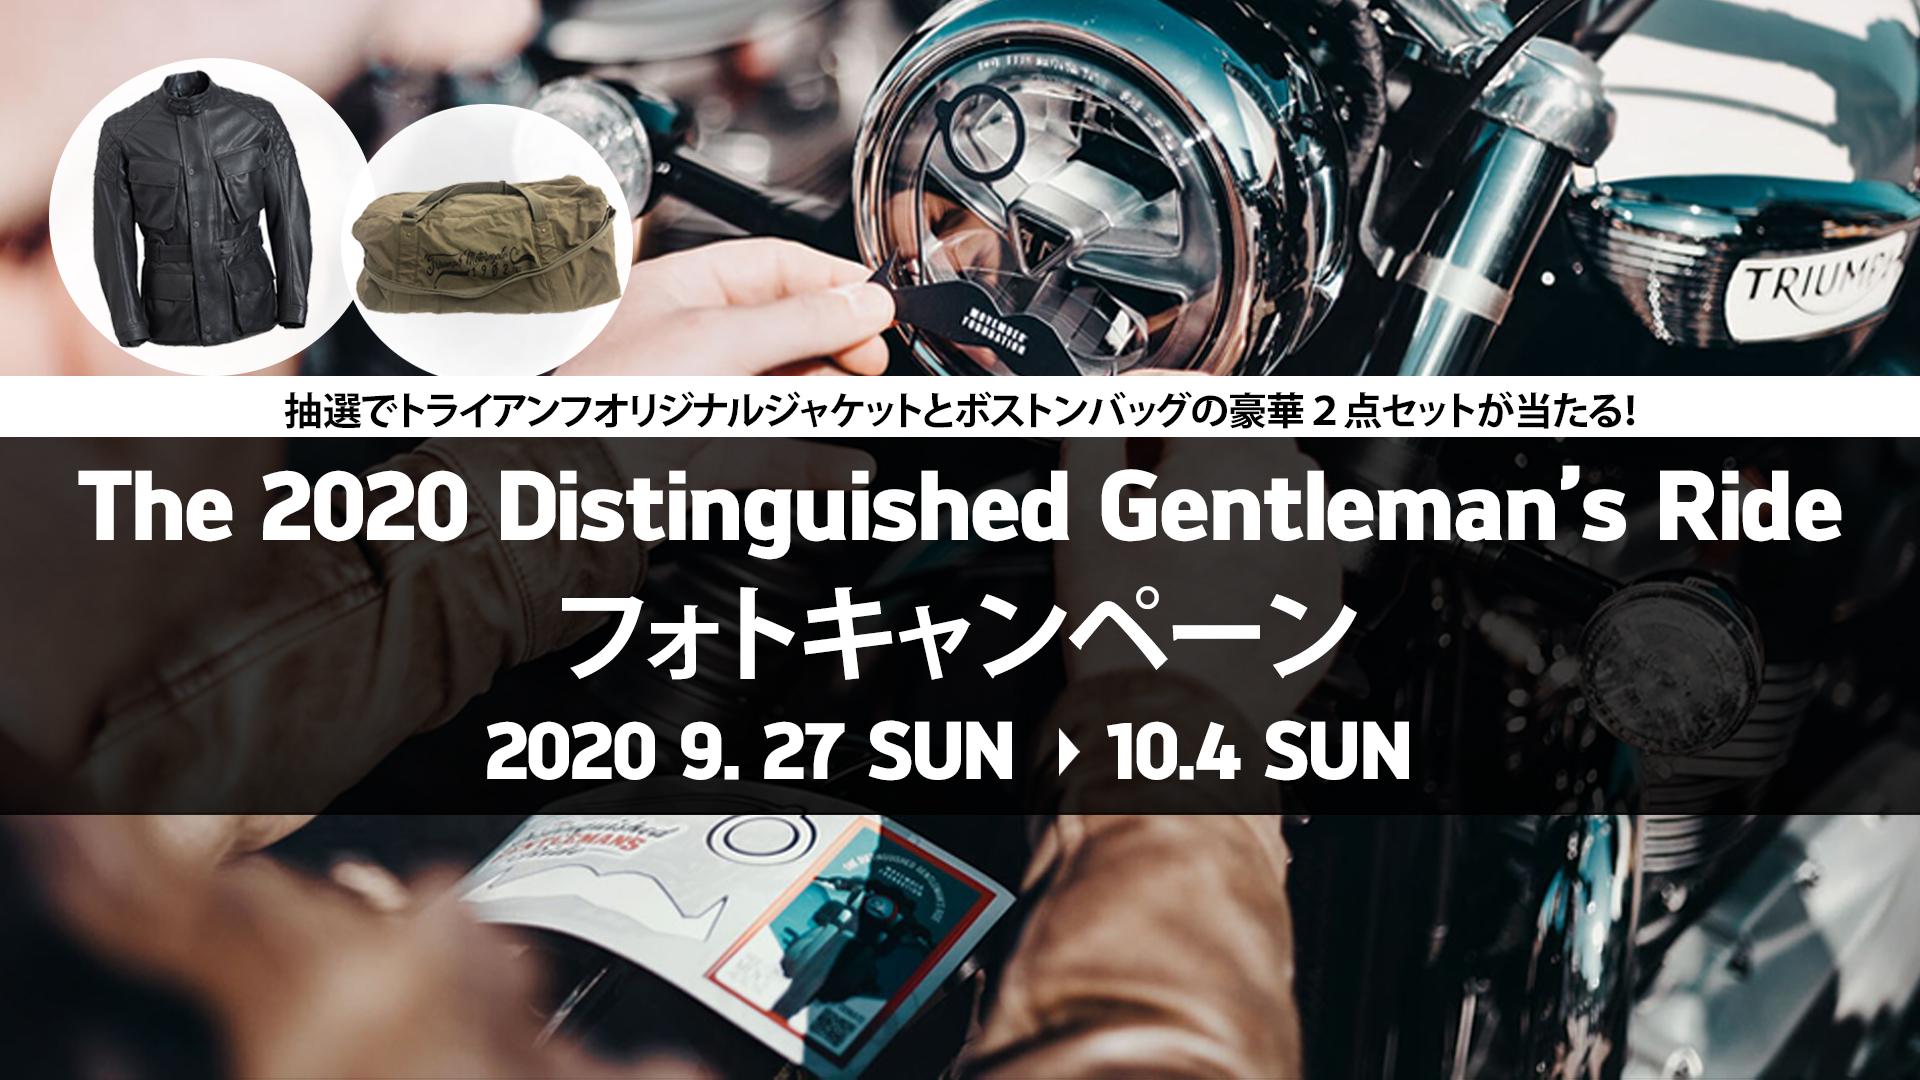 The 2020 Distinguished Gentleman's Ride フォトキャンペーン開催